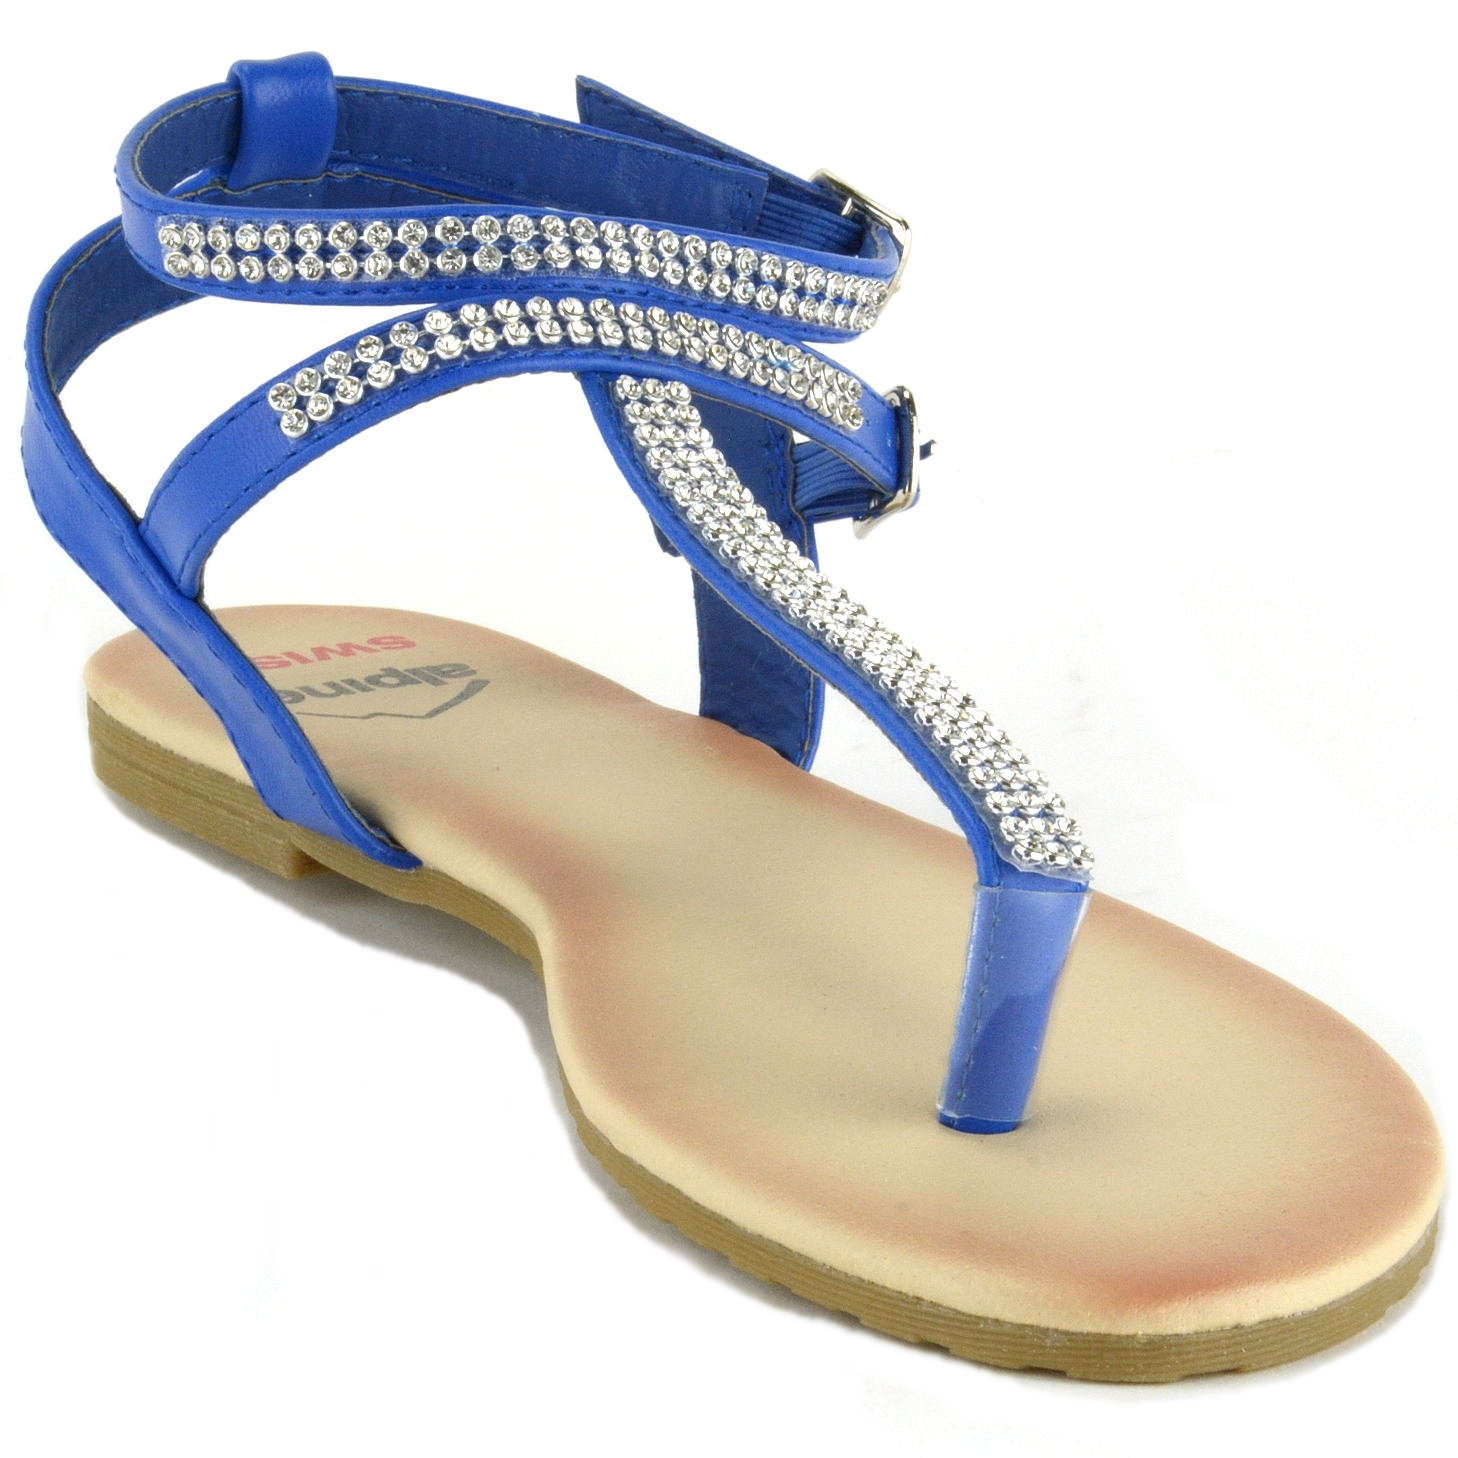 Alpine Swiss Womens Rhinestone T Strap Sandals Ankle Strap